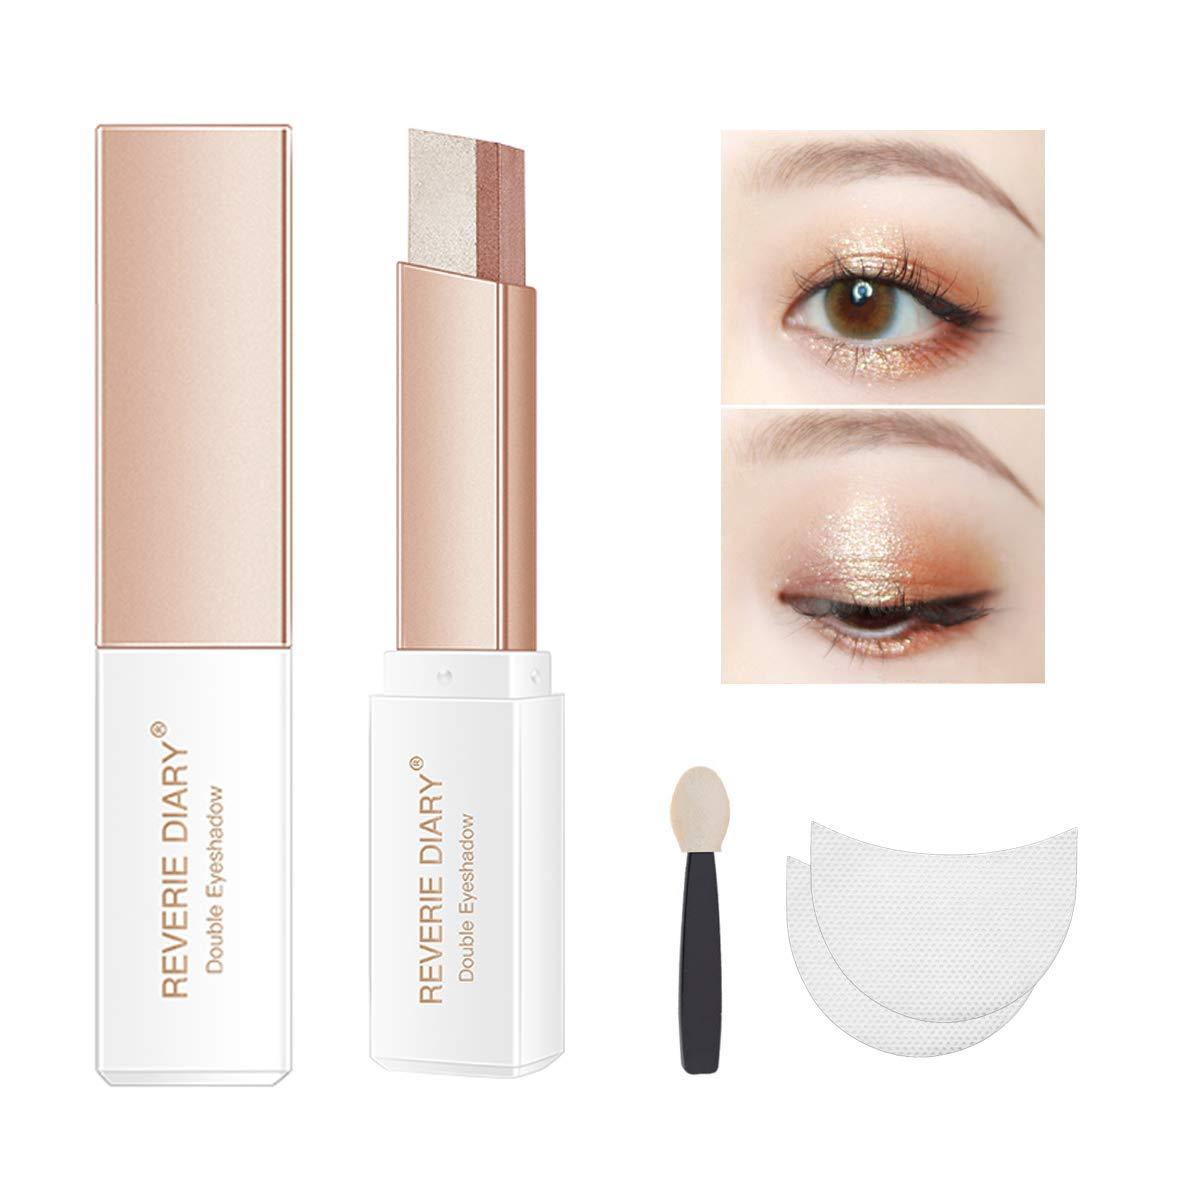 Three-piece eyeshadow stick eyeshadow prush eyeshadow sticker, eyeshadow stick two-color gradient glitter eye shadow pen rotating design, simple makeup, waterproof and not Blooming (RoseGold)